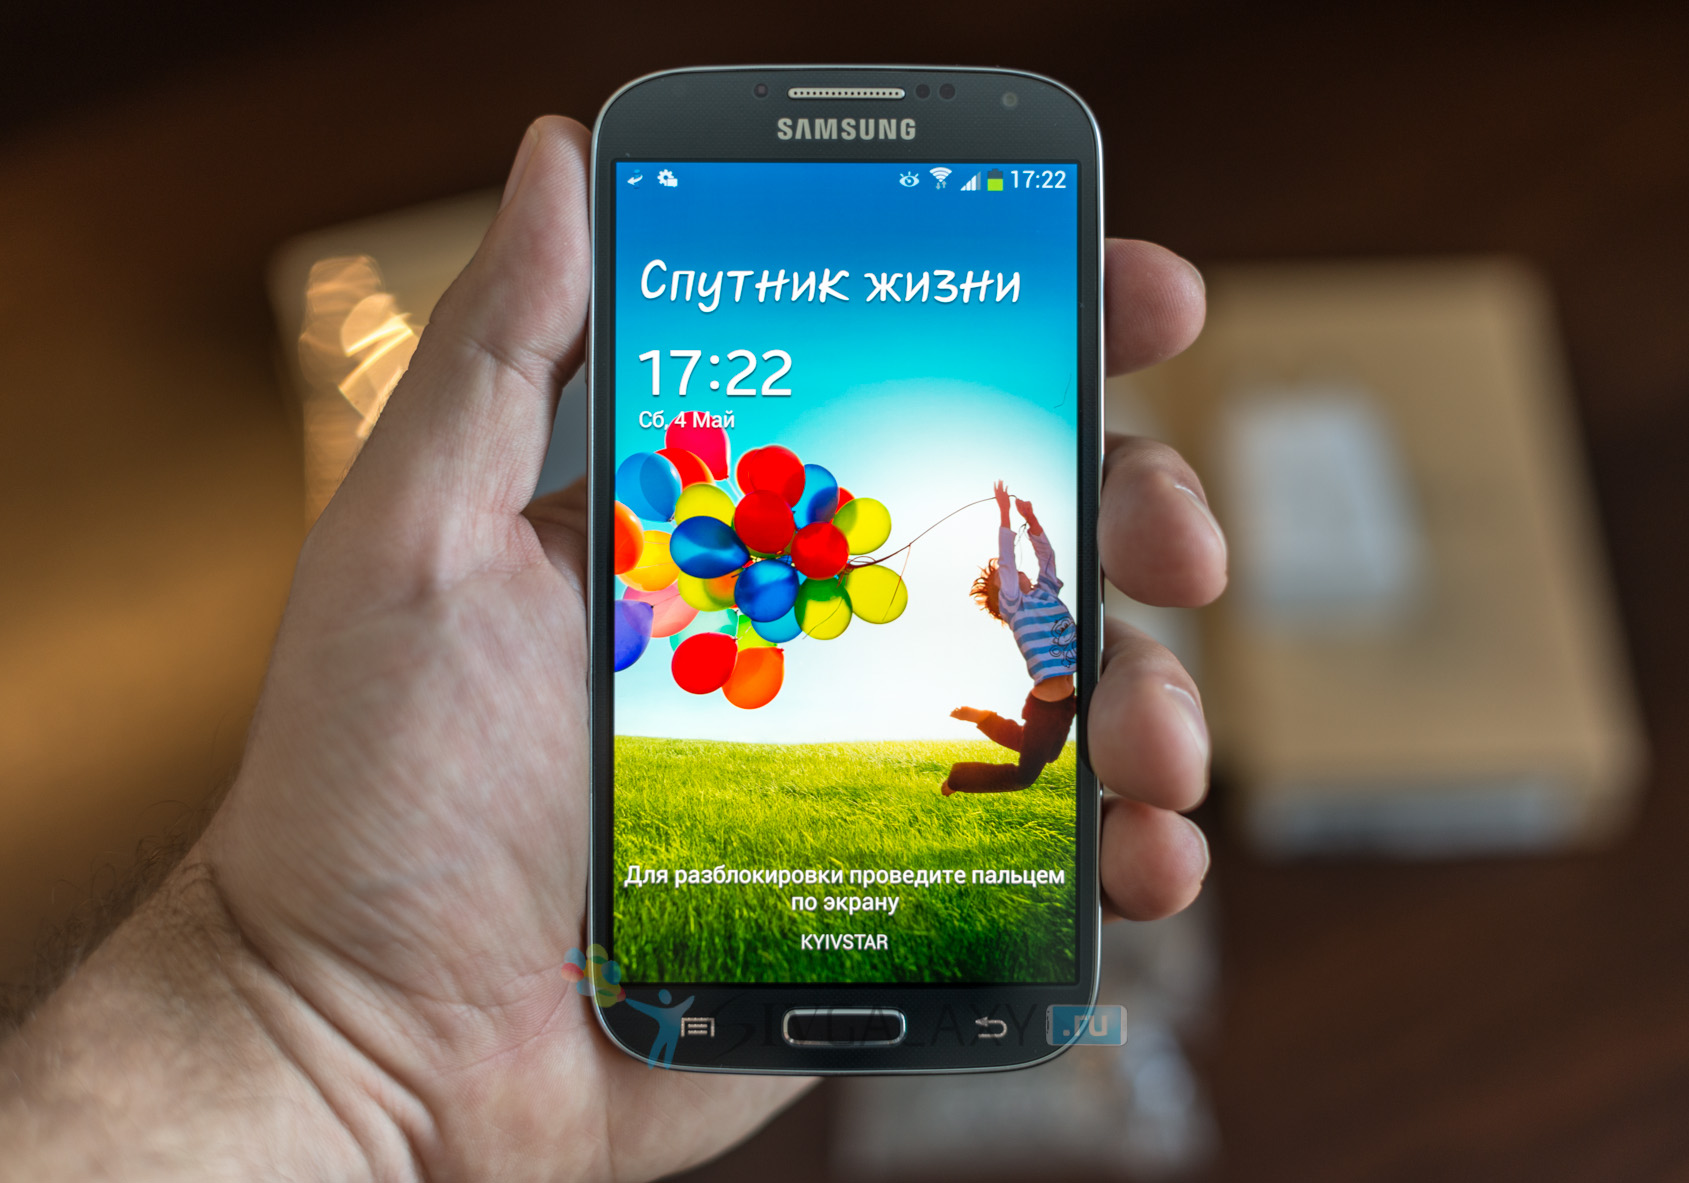 Samsung Galaxy S4 в руке